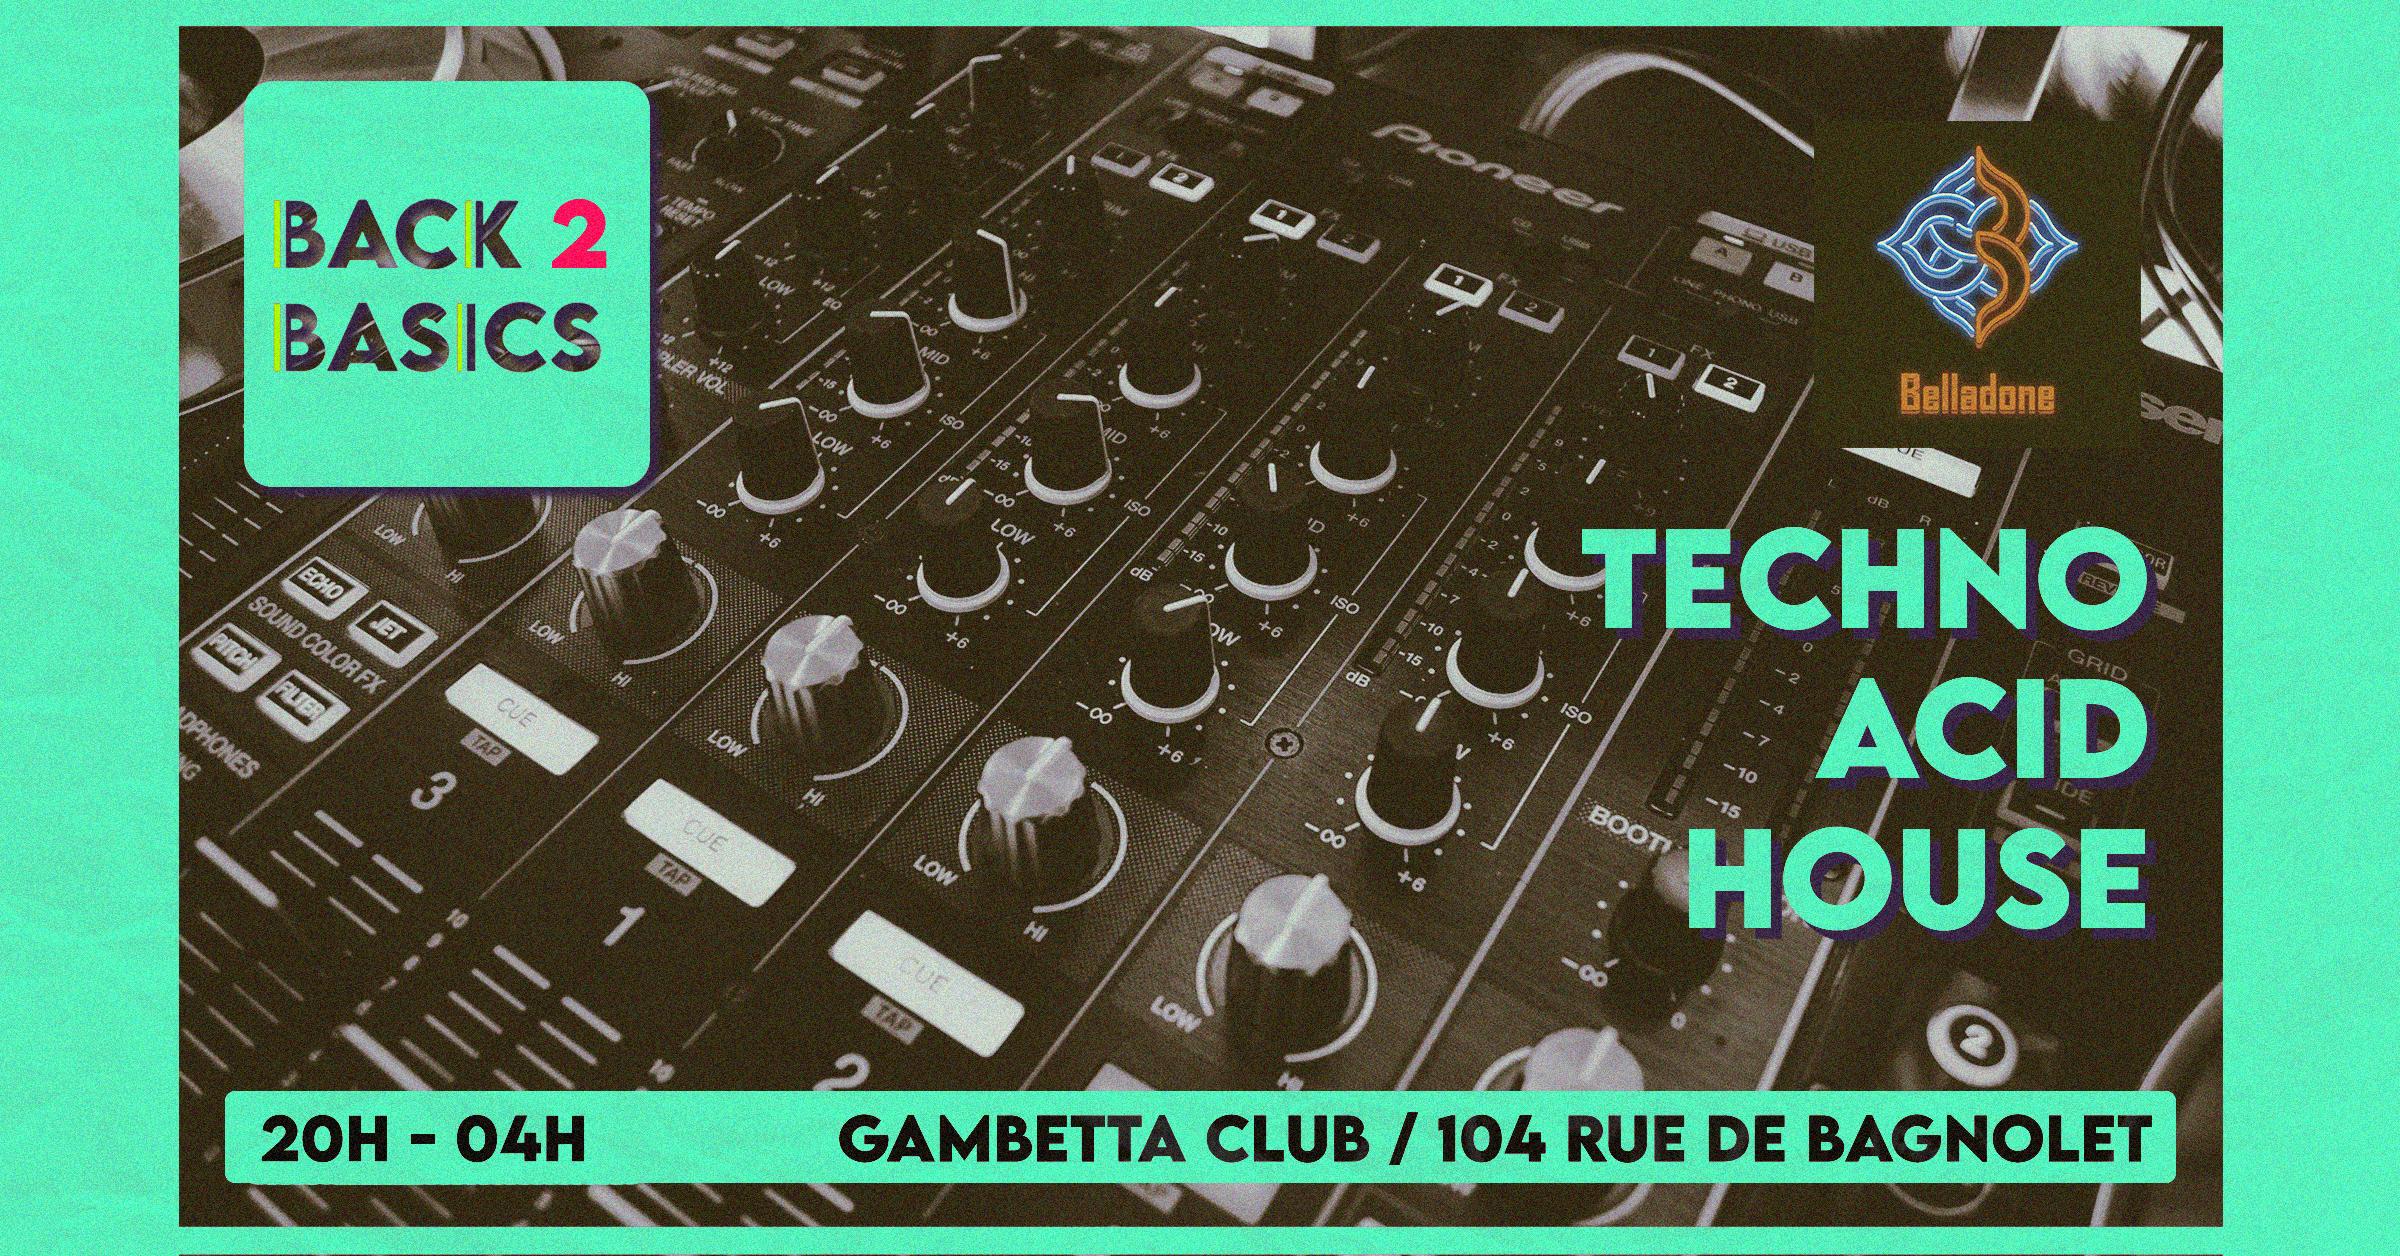 JEUDI 01/07 - Back To Basics - Techno/Acid/House